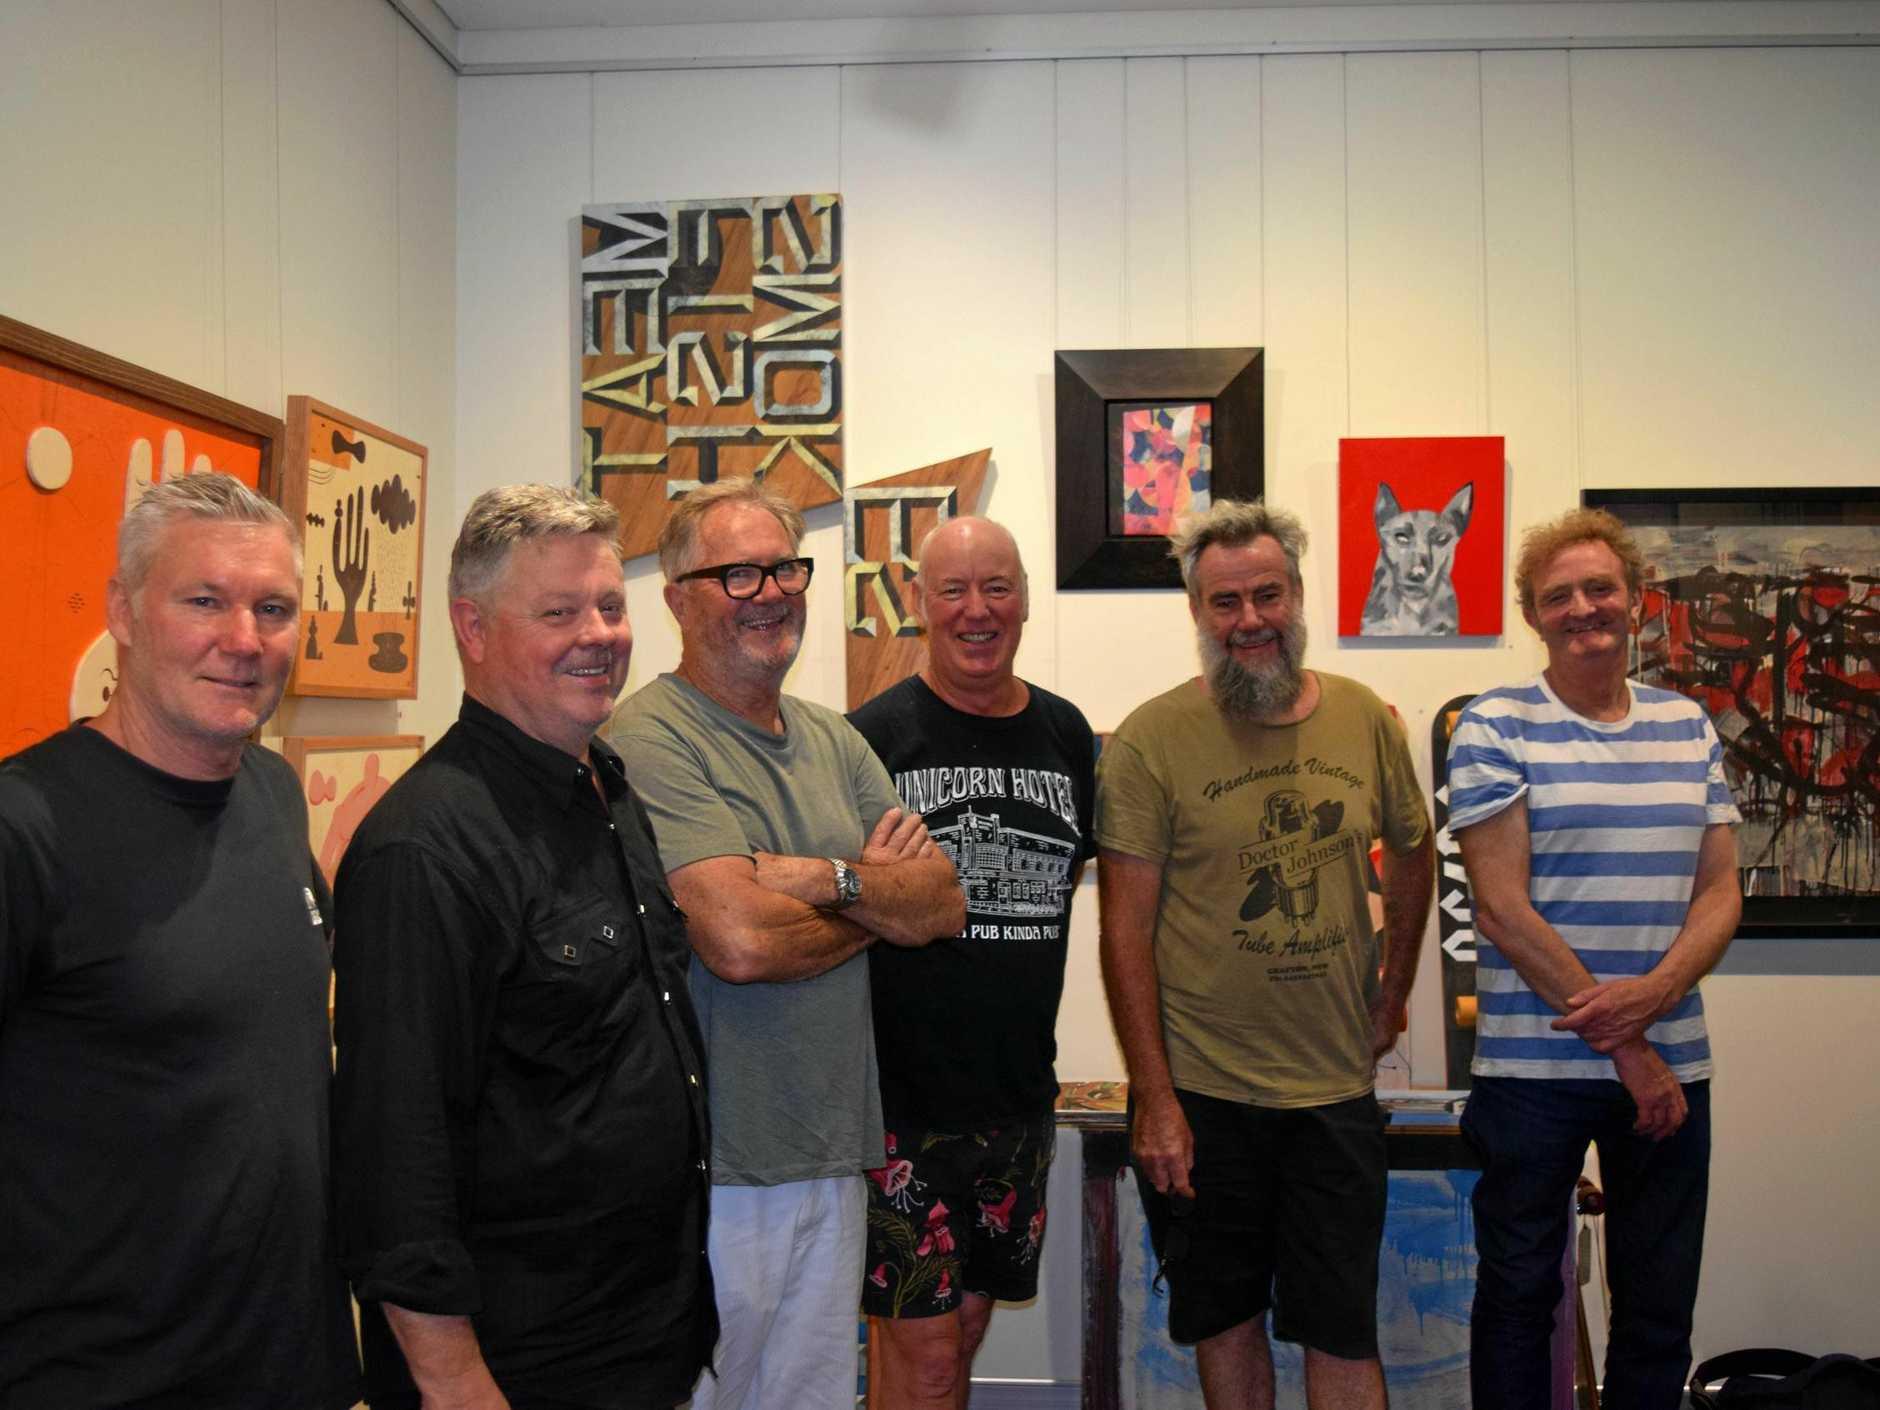 Mambo Founder with original artists: Jim Mitchell, David McKay, Founder Dare Jennings, Paul McNeil, Robert Moore, Gerry Wedd.